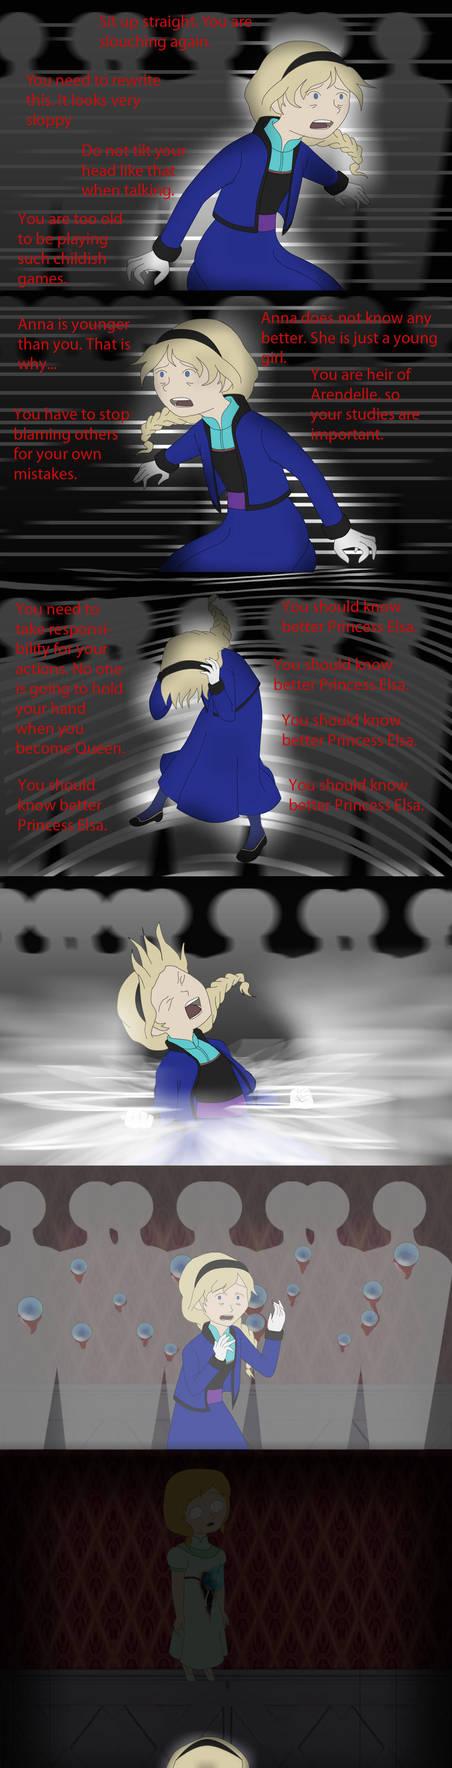 Nightmare by sasuhina123